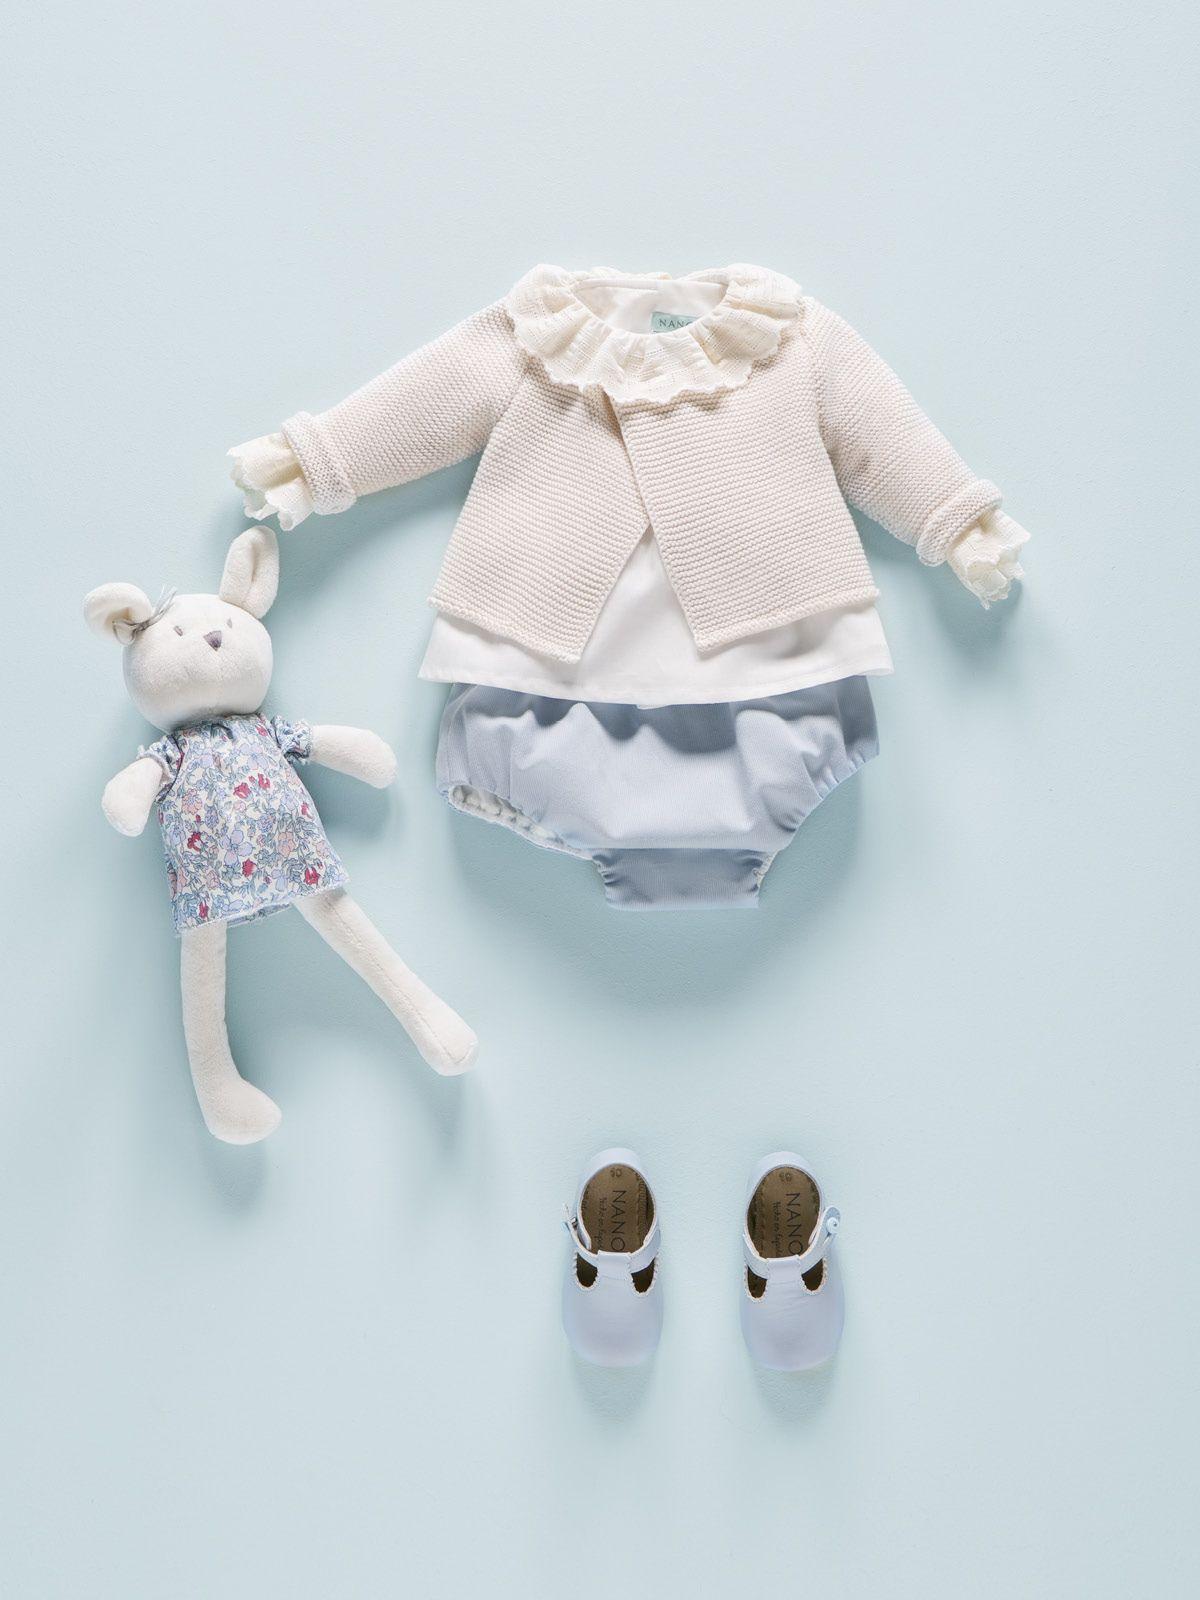 18dc4898f82c NANOS SHOP ONLINE. Detalle | Kids | Ropa de bebe recien nacido ...